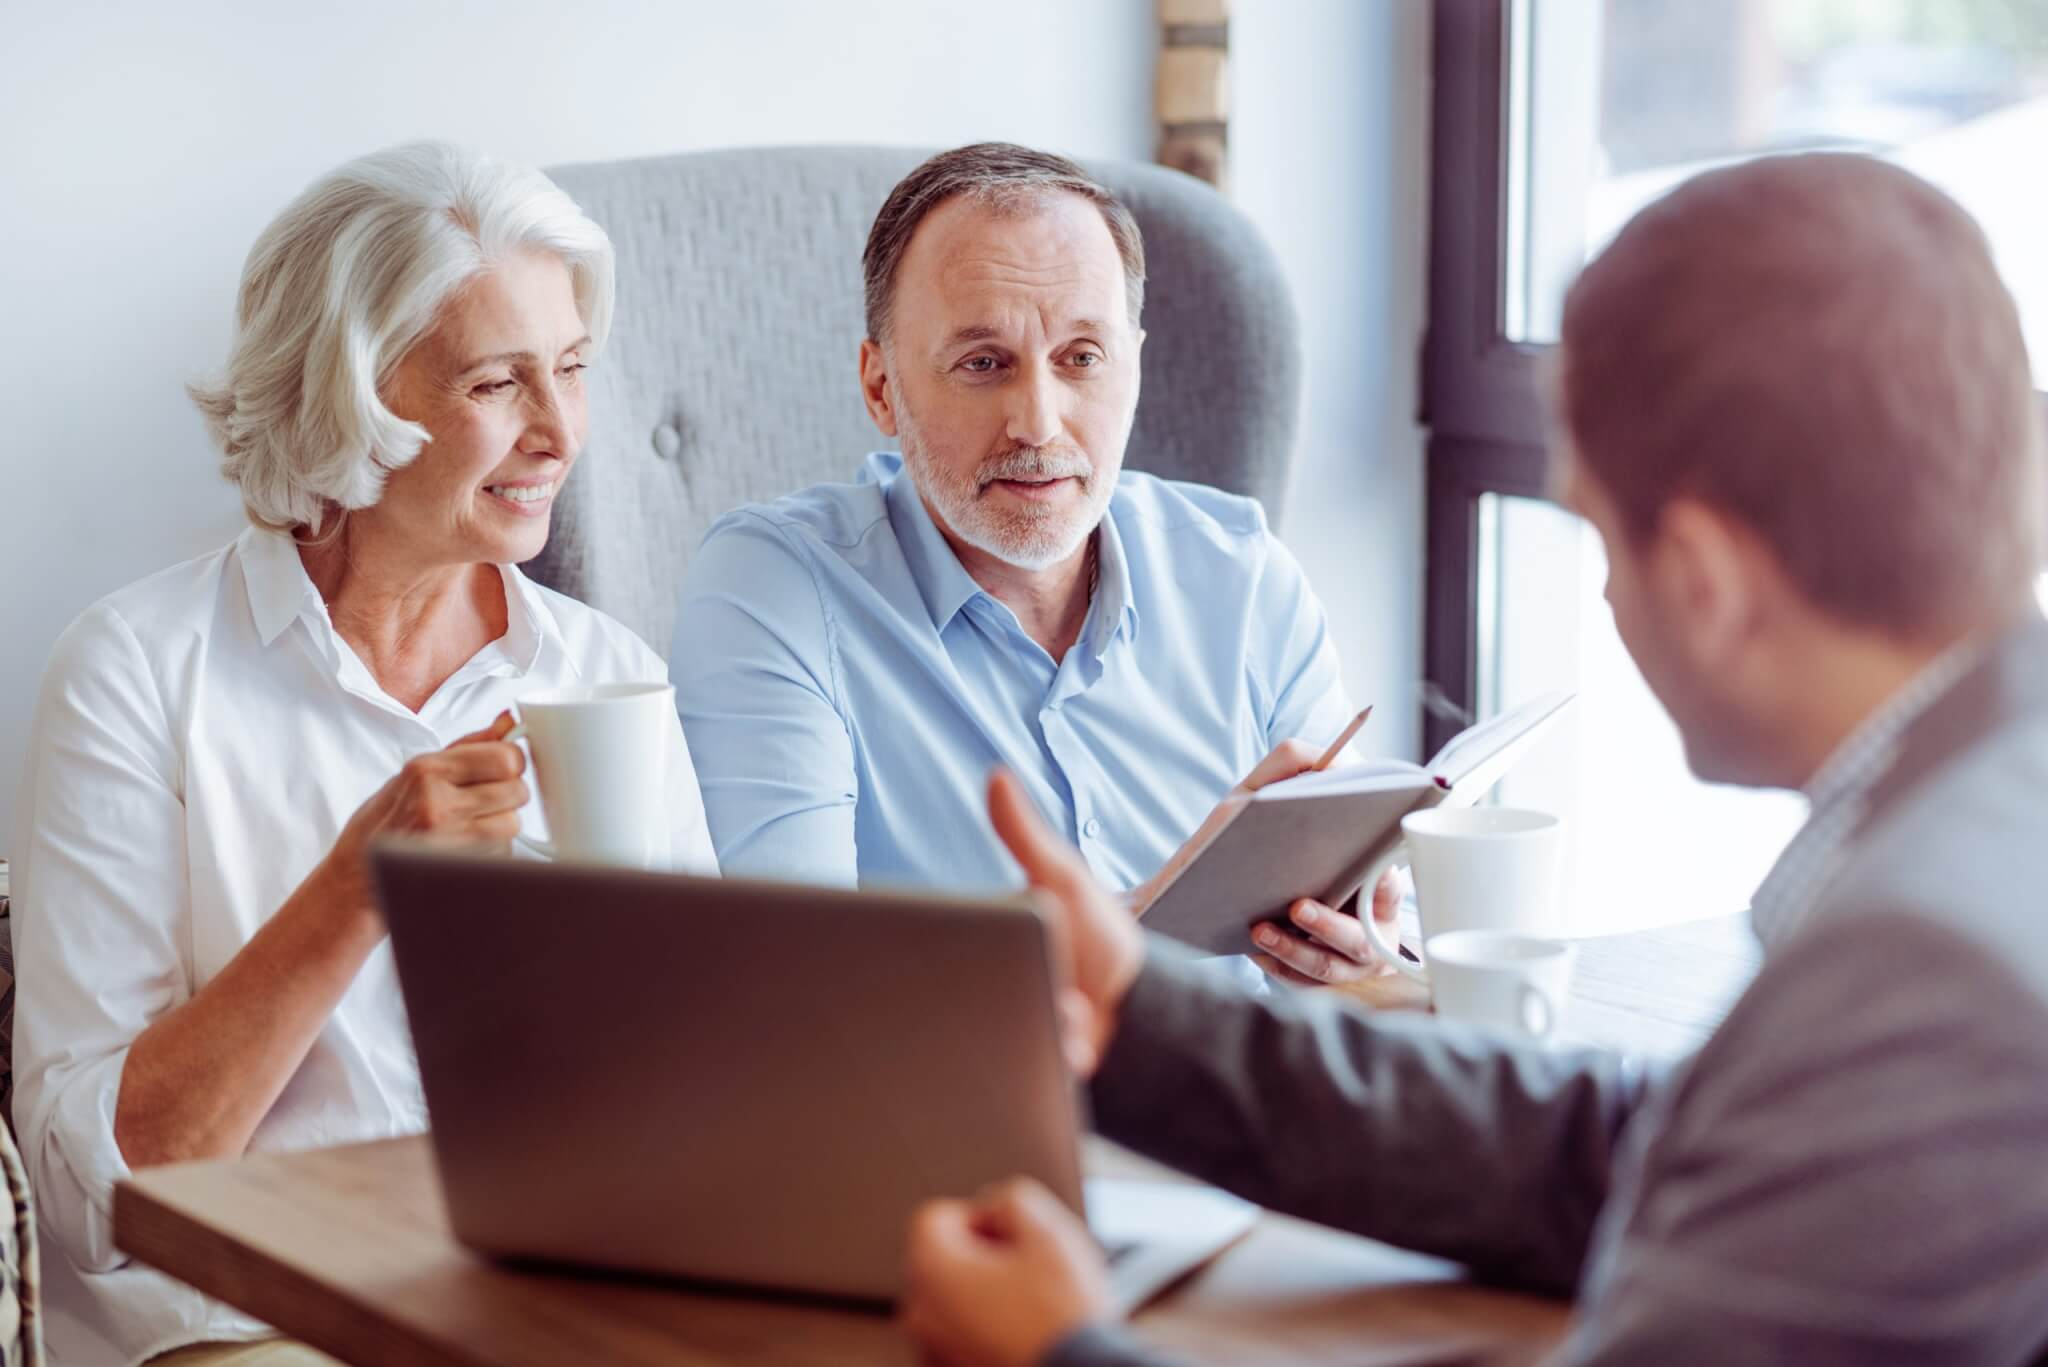 Major health insurance provider identifies actionable needs-based segments Case Study